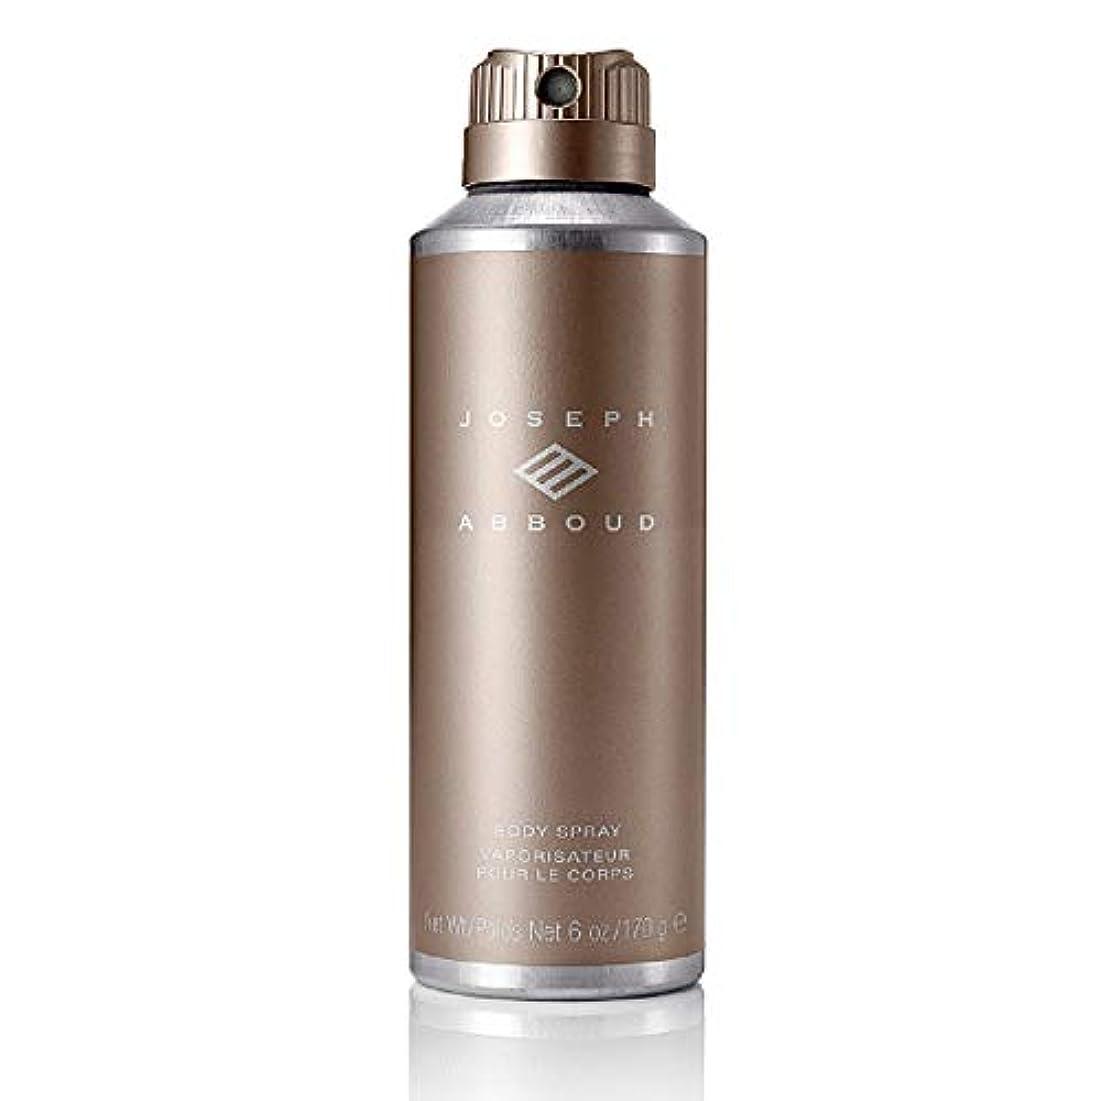 Joseph Abboud ボディスプレー - 男性のための洗練された、官能的なフレグランス香水 - 大胆な男性の香り - フレッシュシトラス。竹、ラベンダー、ゼラニウム、セージ - 6オズ